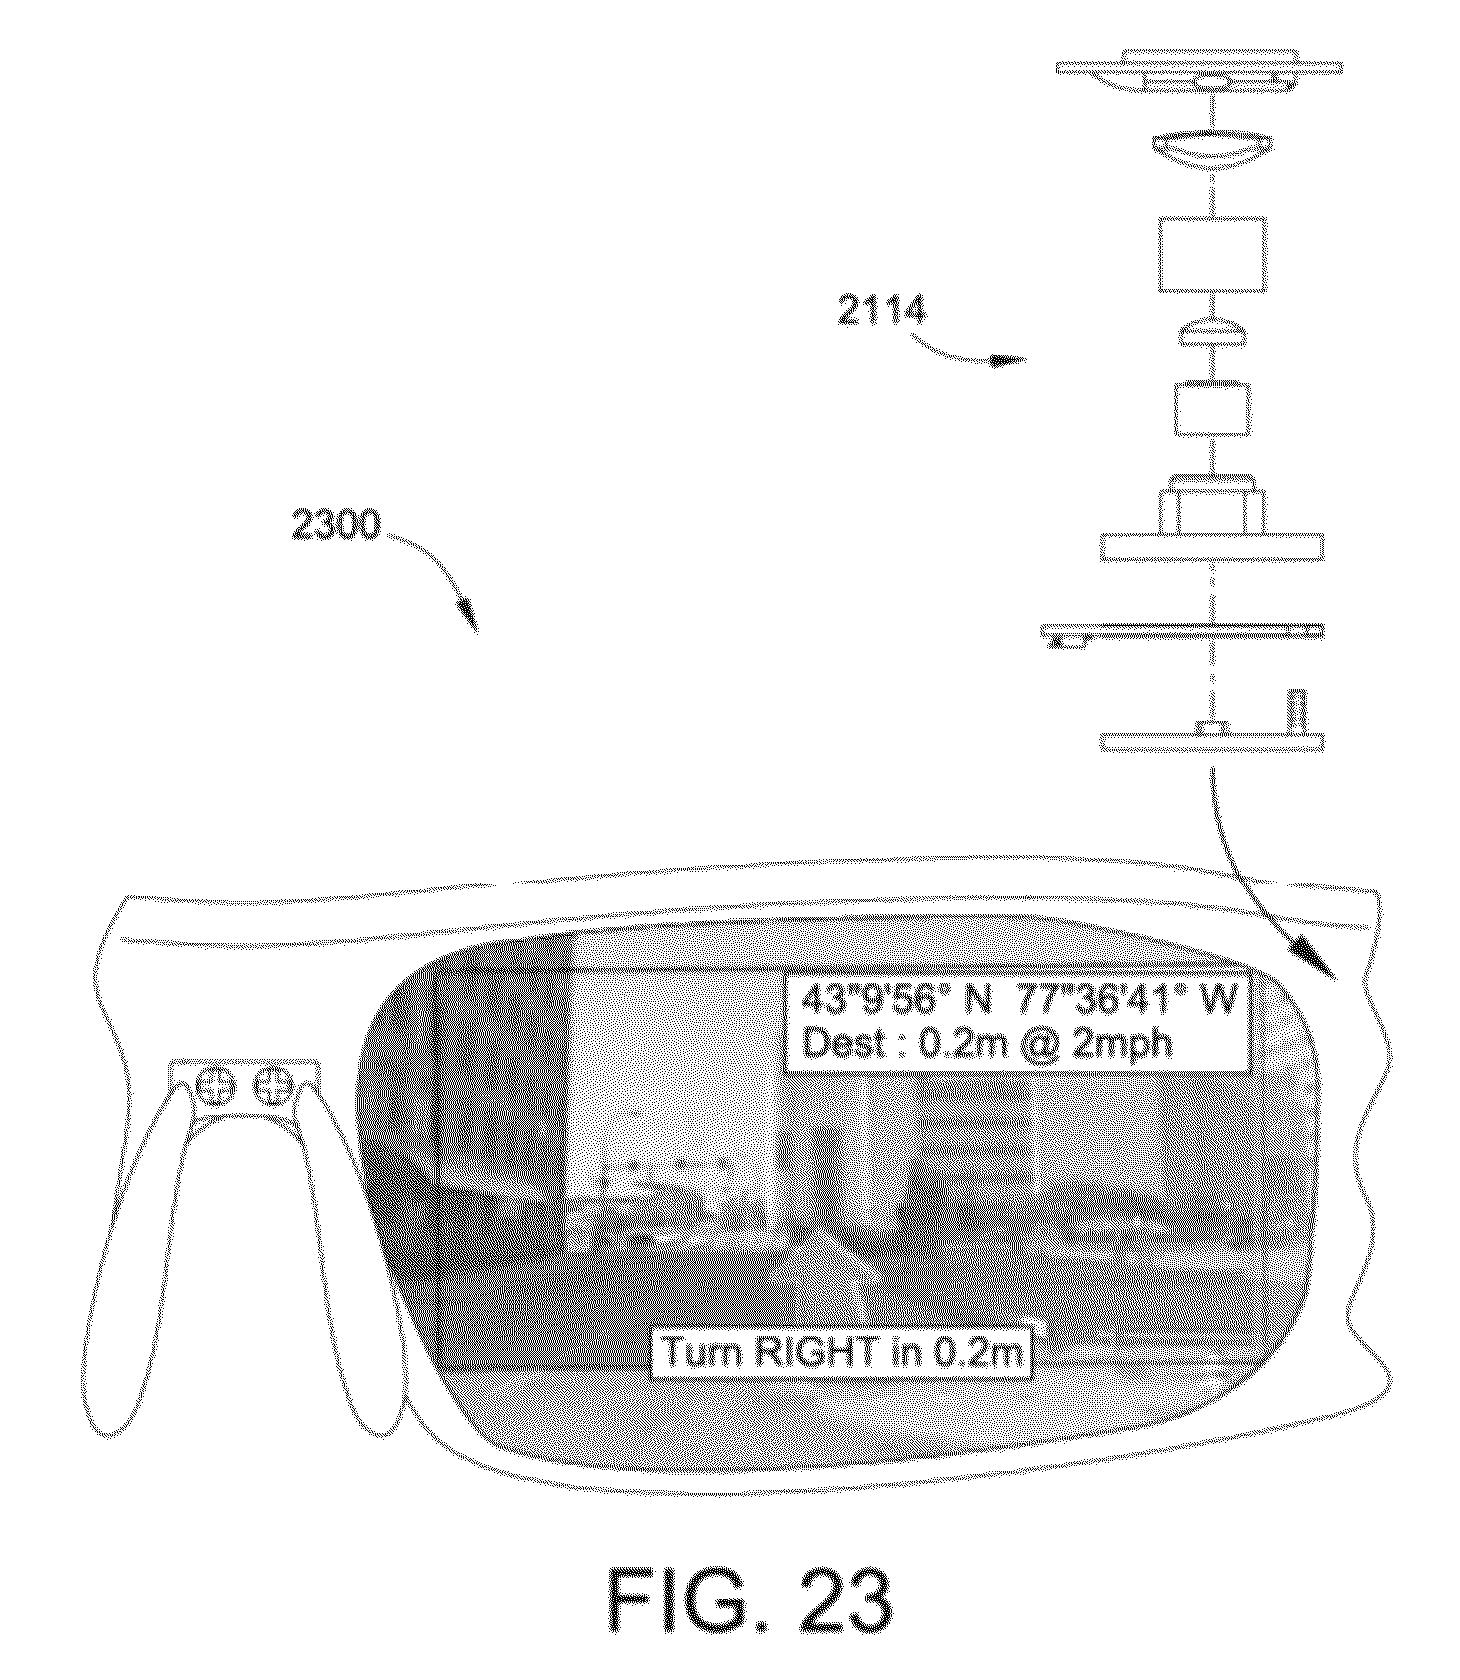 f520e6ca5a ... Patent images ...